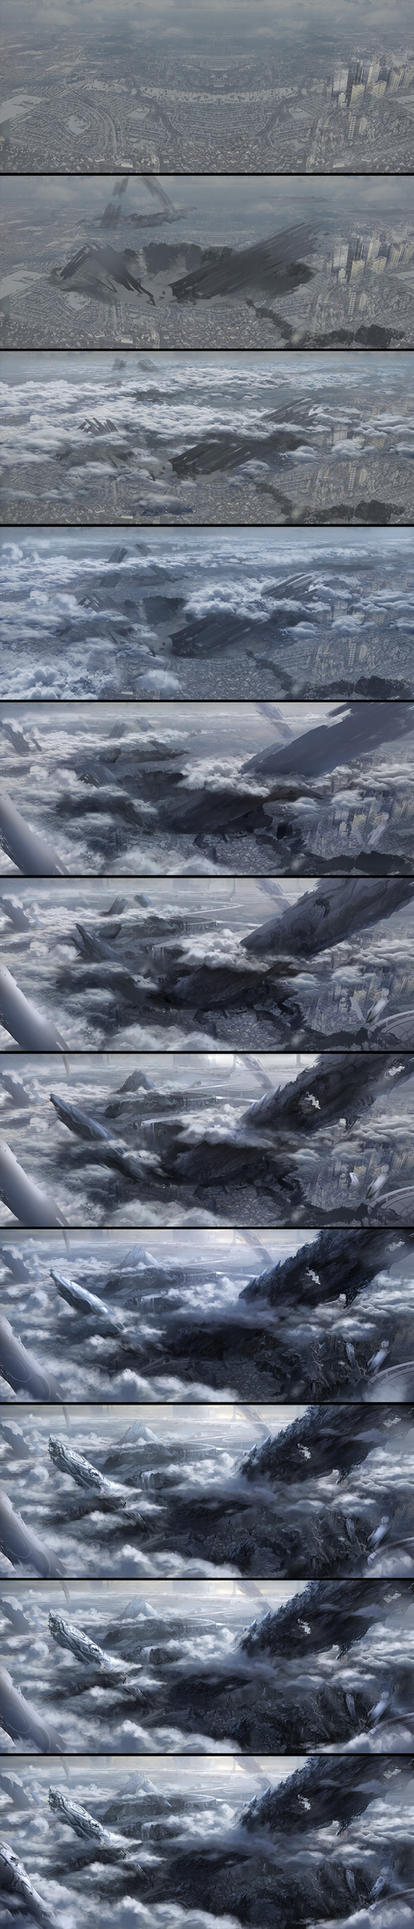 War relics-1 by wanbao